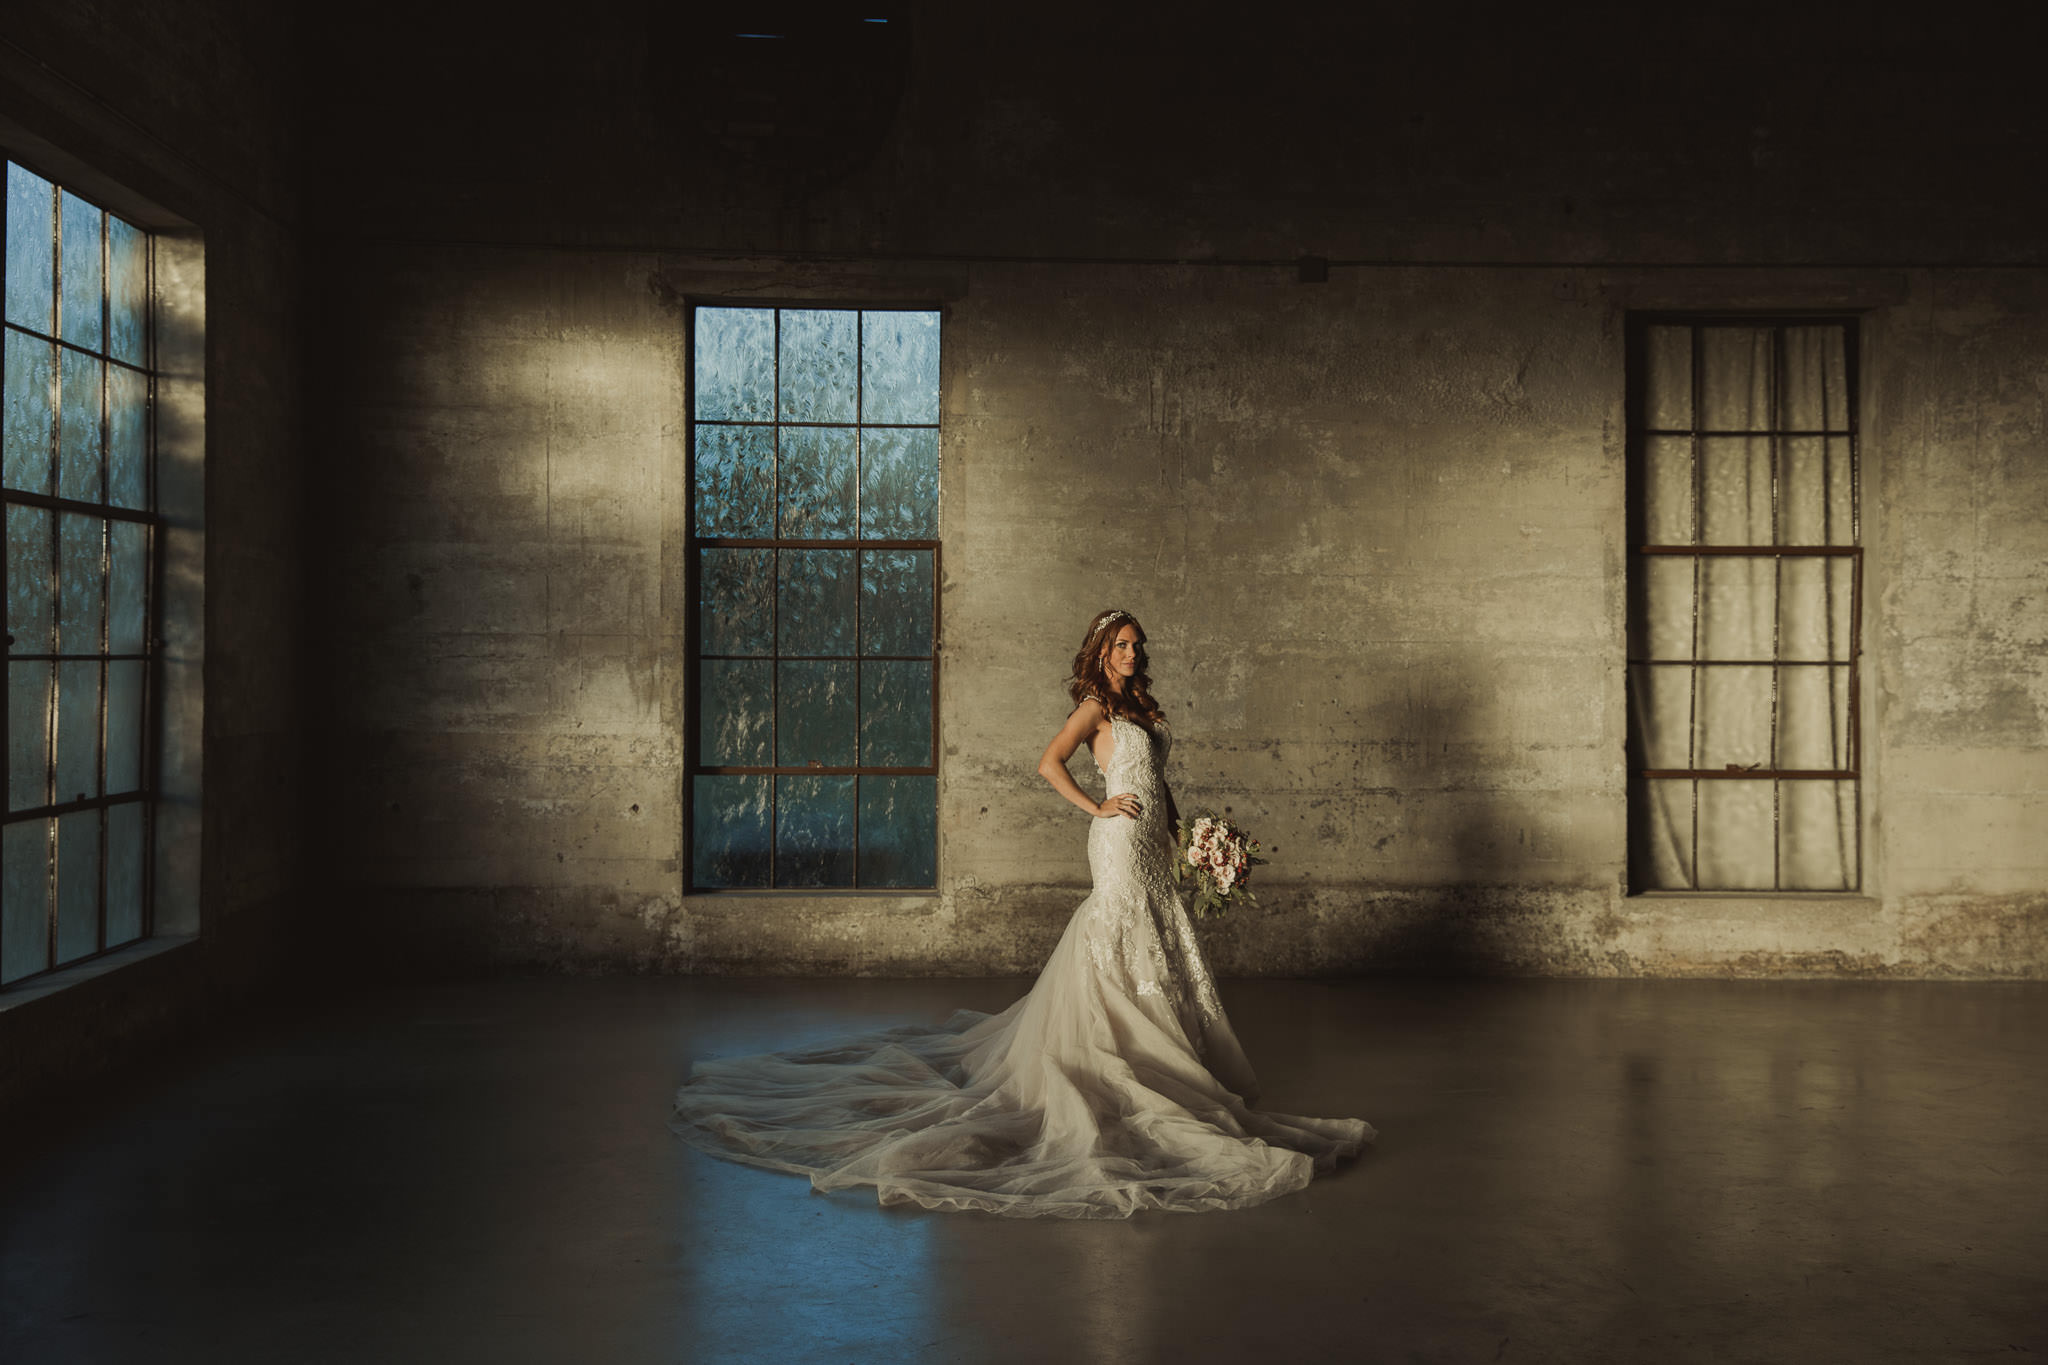 Cynthia-Curtis-Olde-Dobbine-Station-Houston-Wedding-Photographer-sm-64.jpg